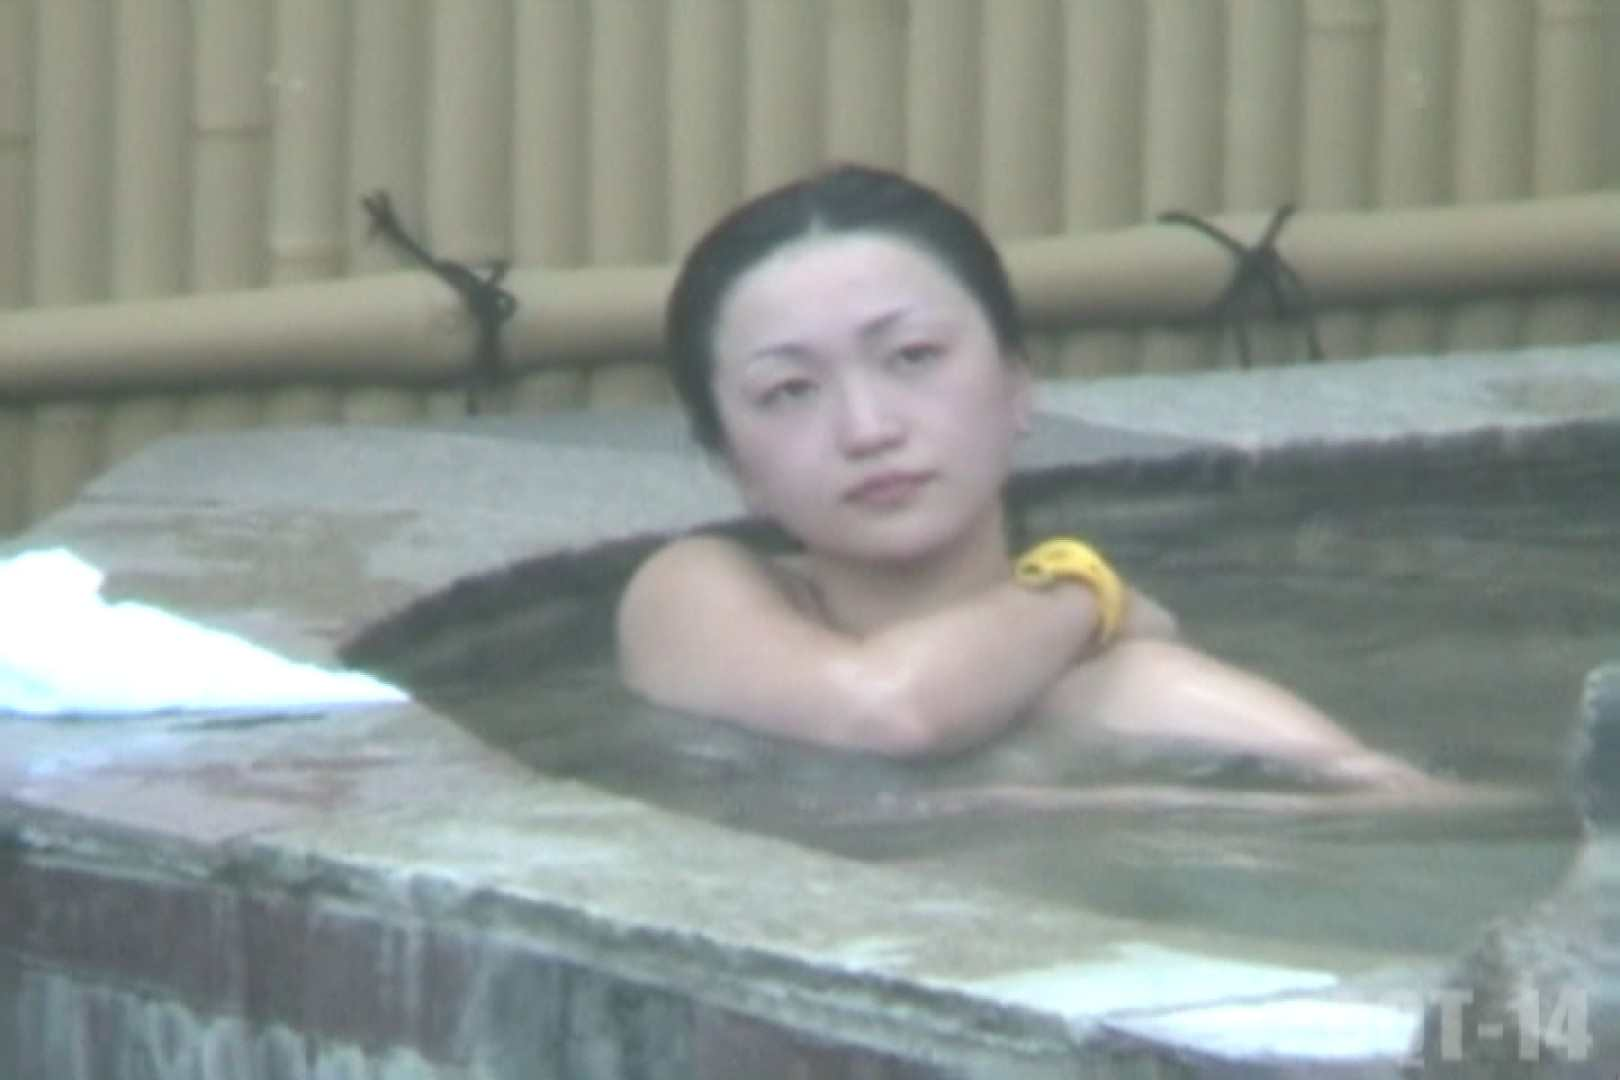 Aquaな露天風呂Vol.826 盗撮  84連発 40